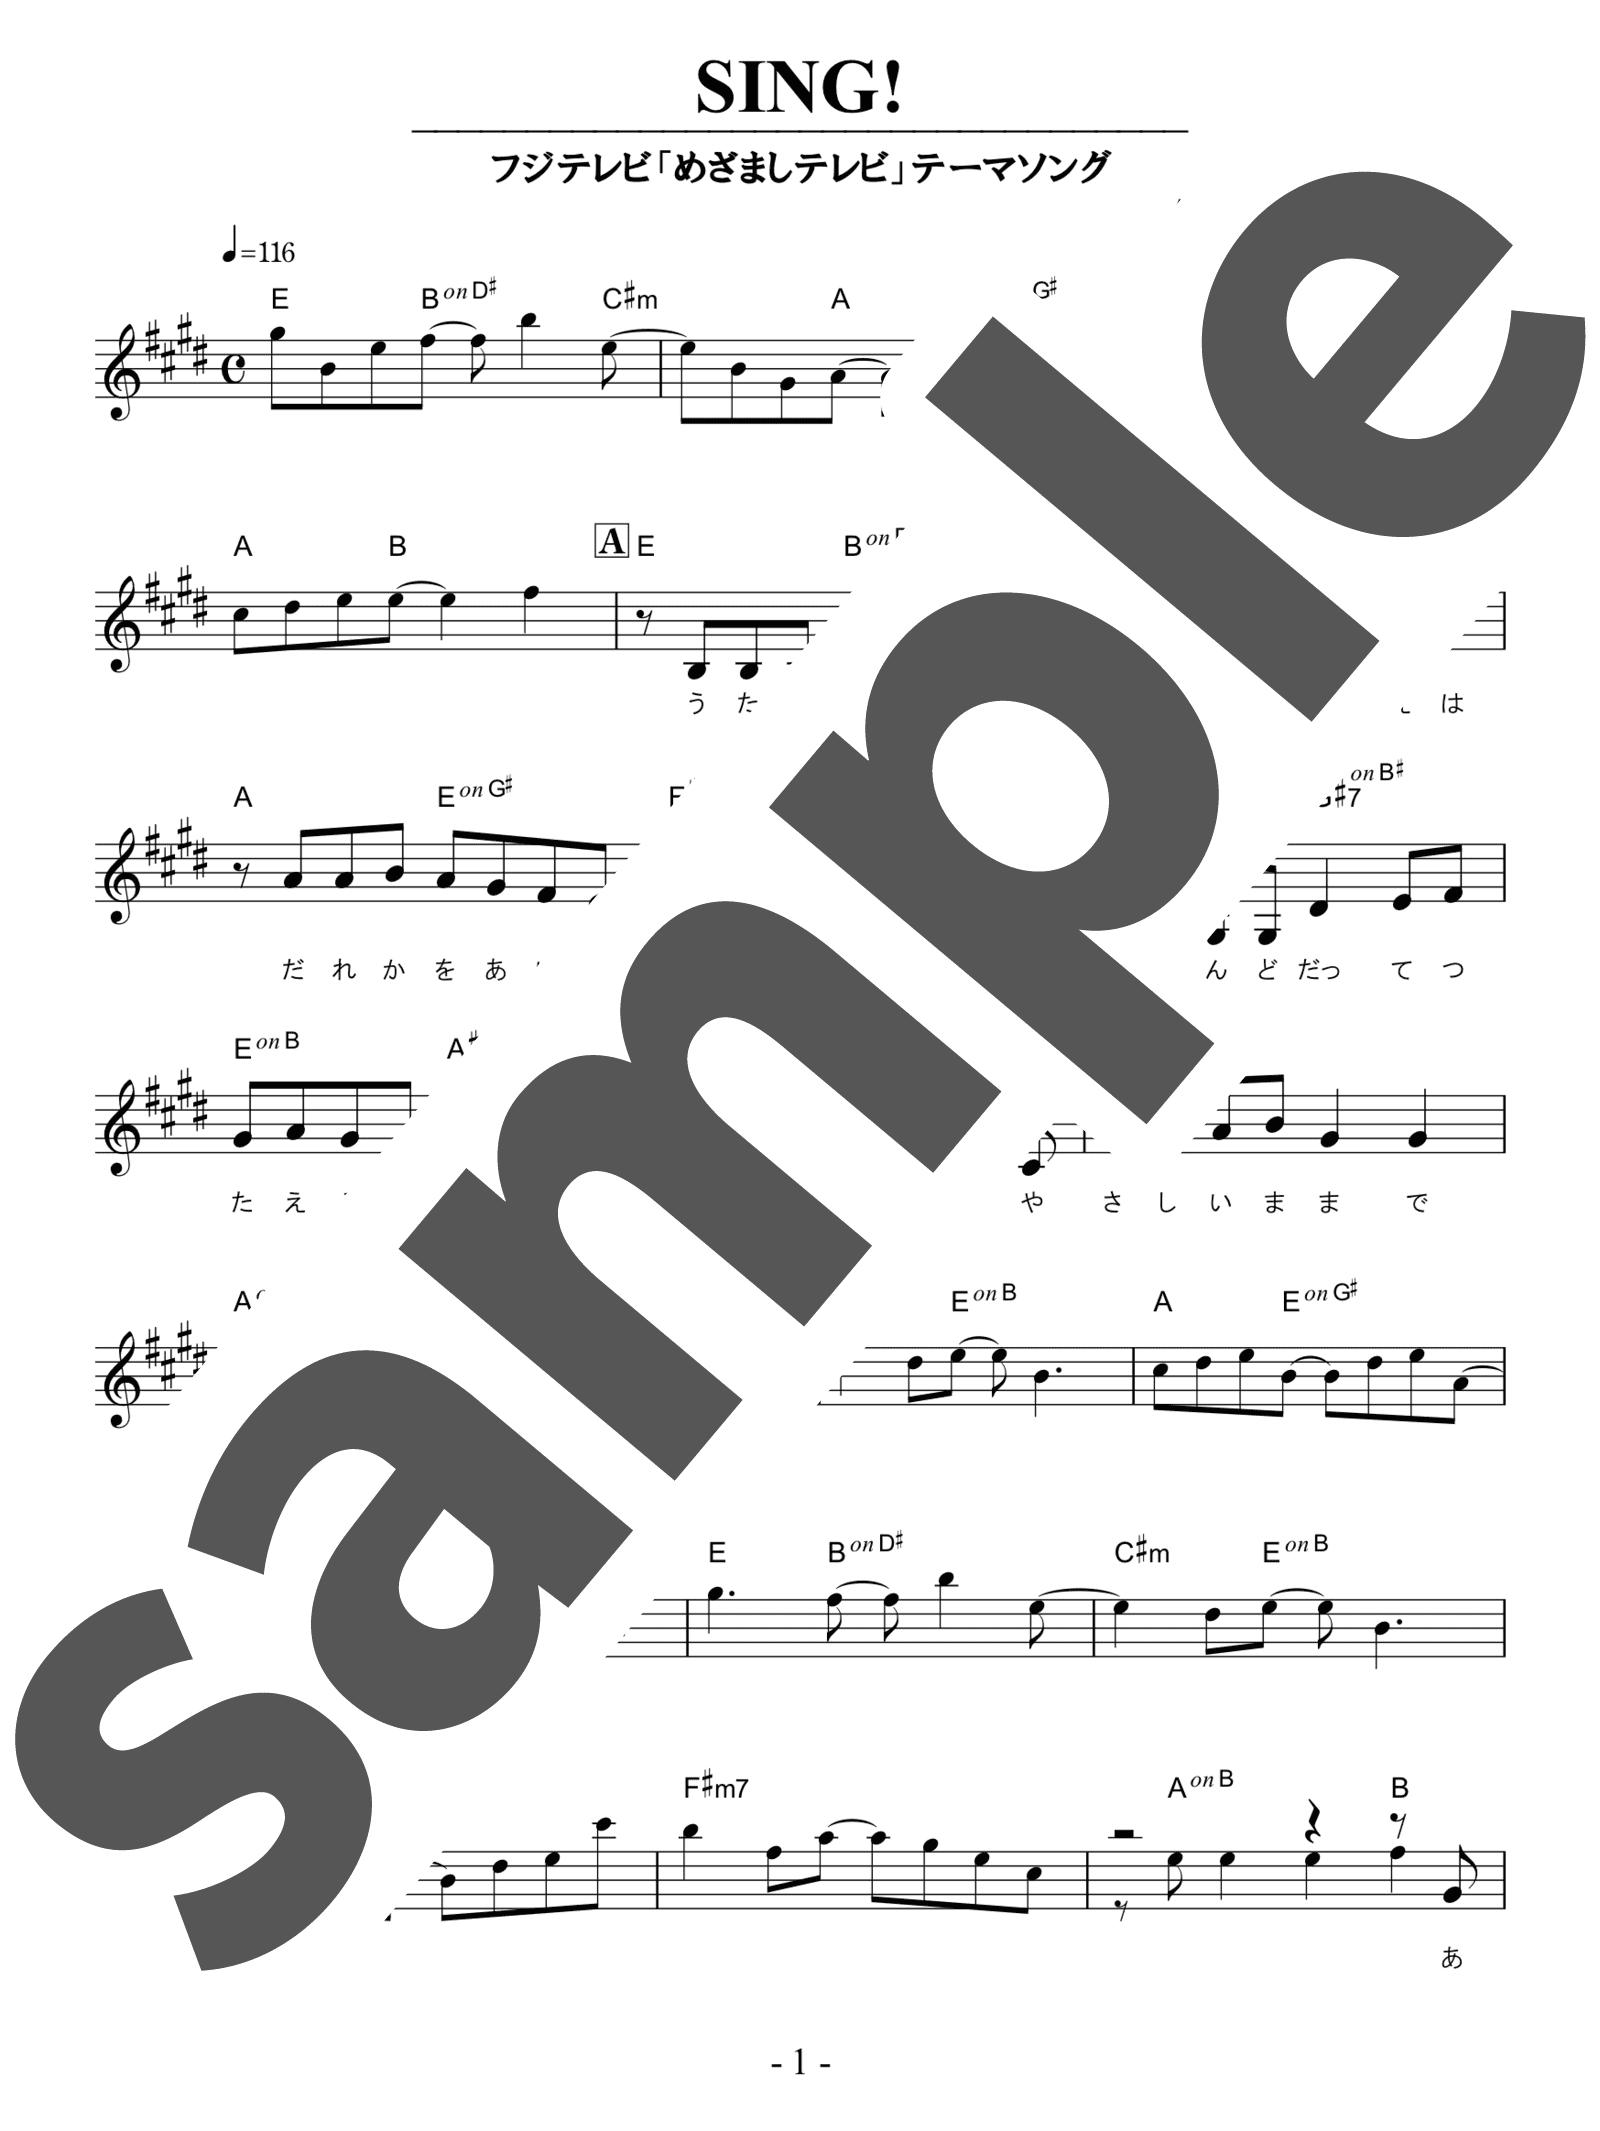 「SING!」のサンプル楽譜